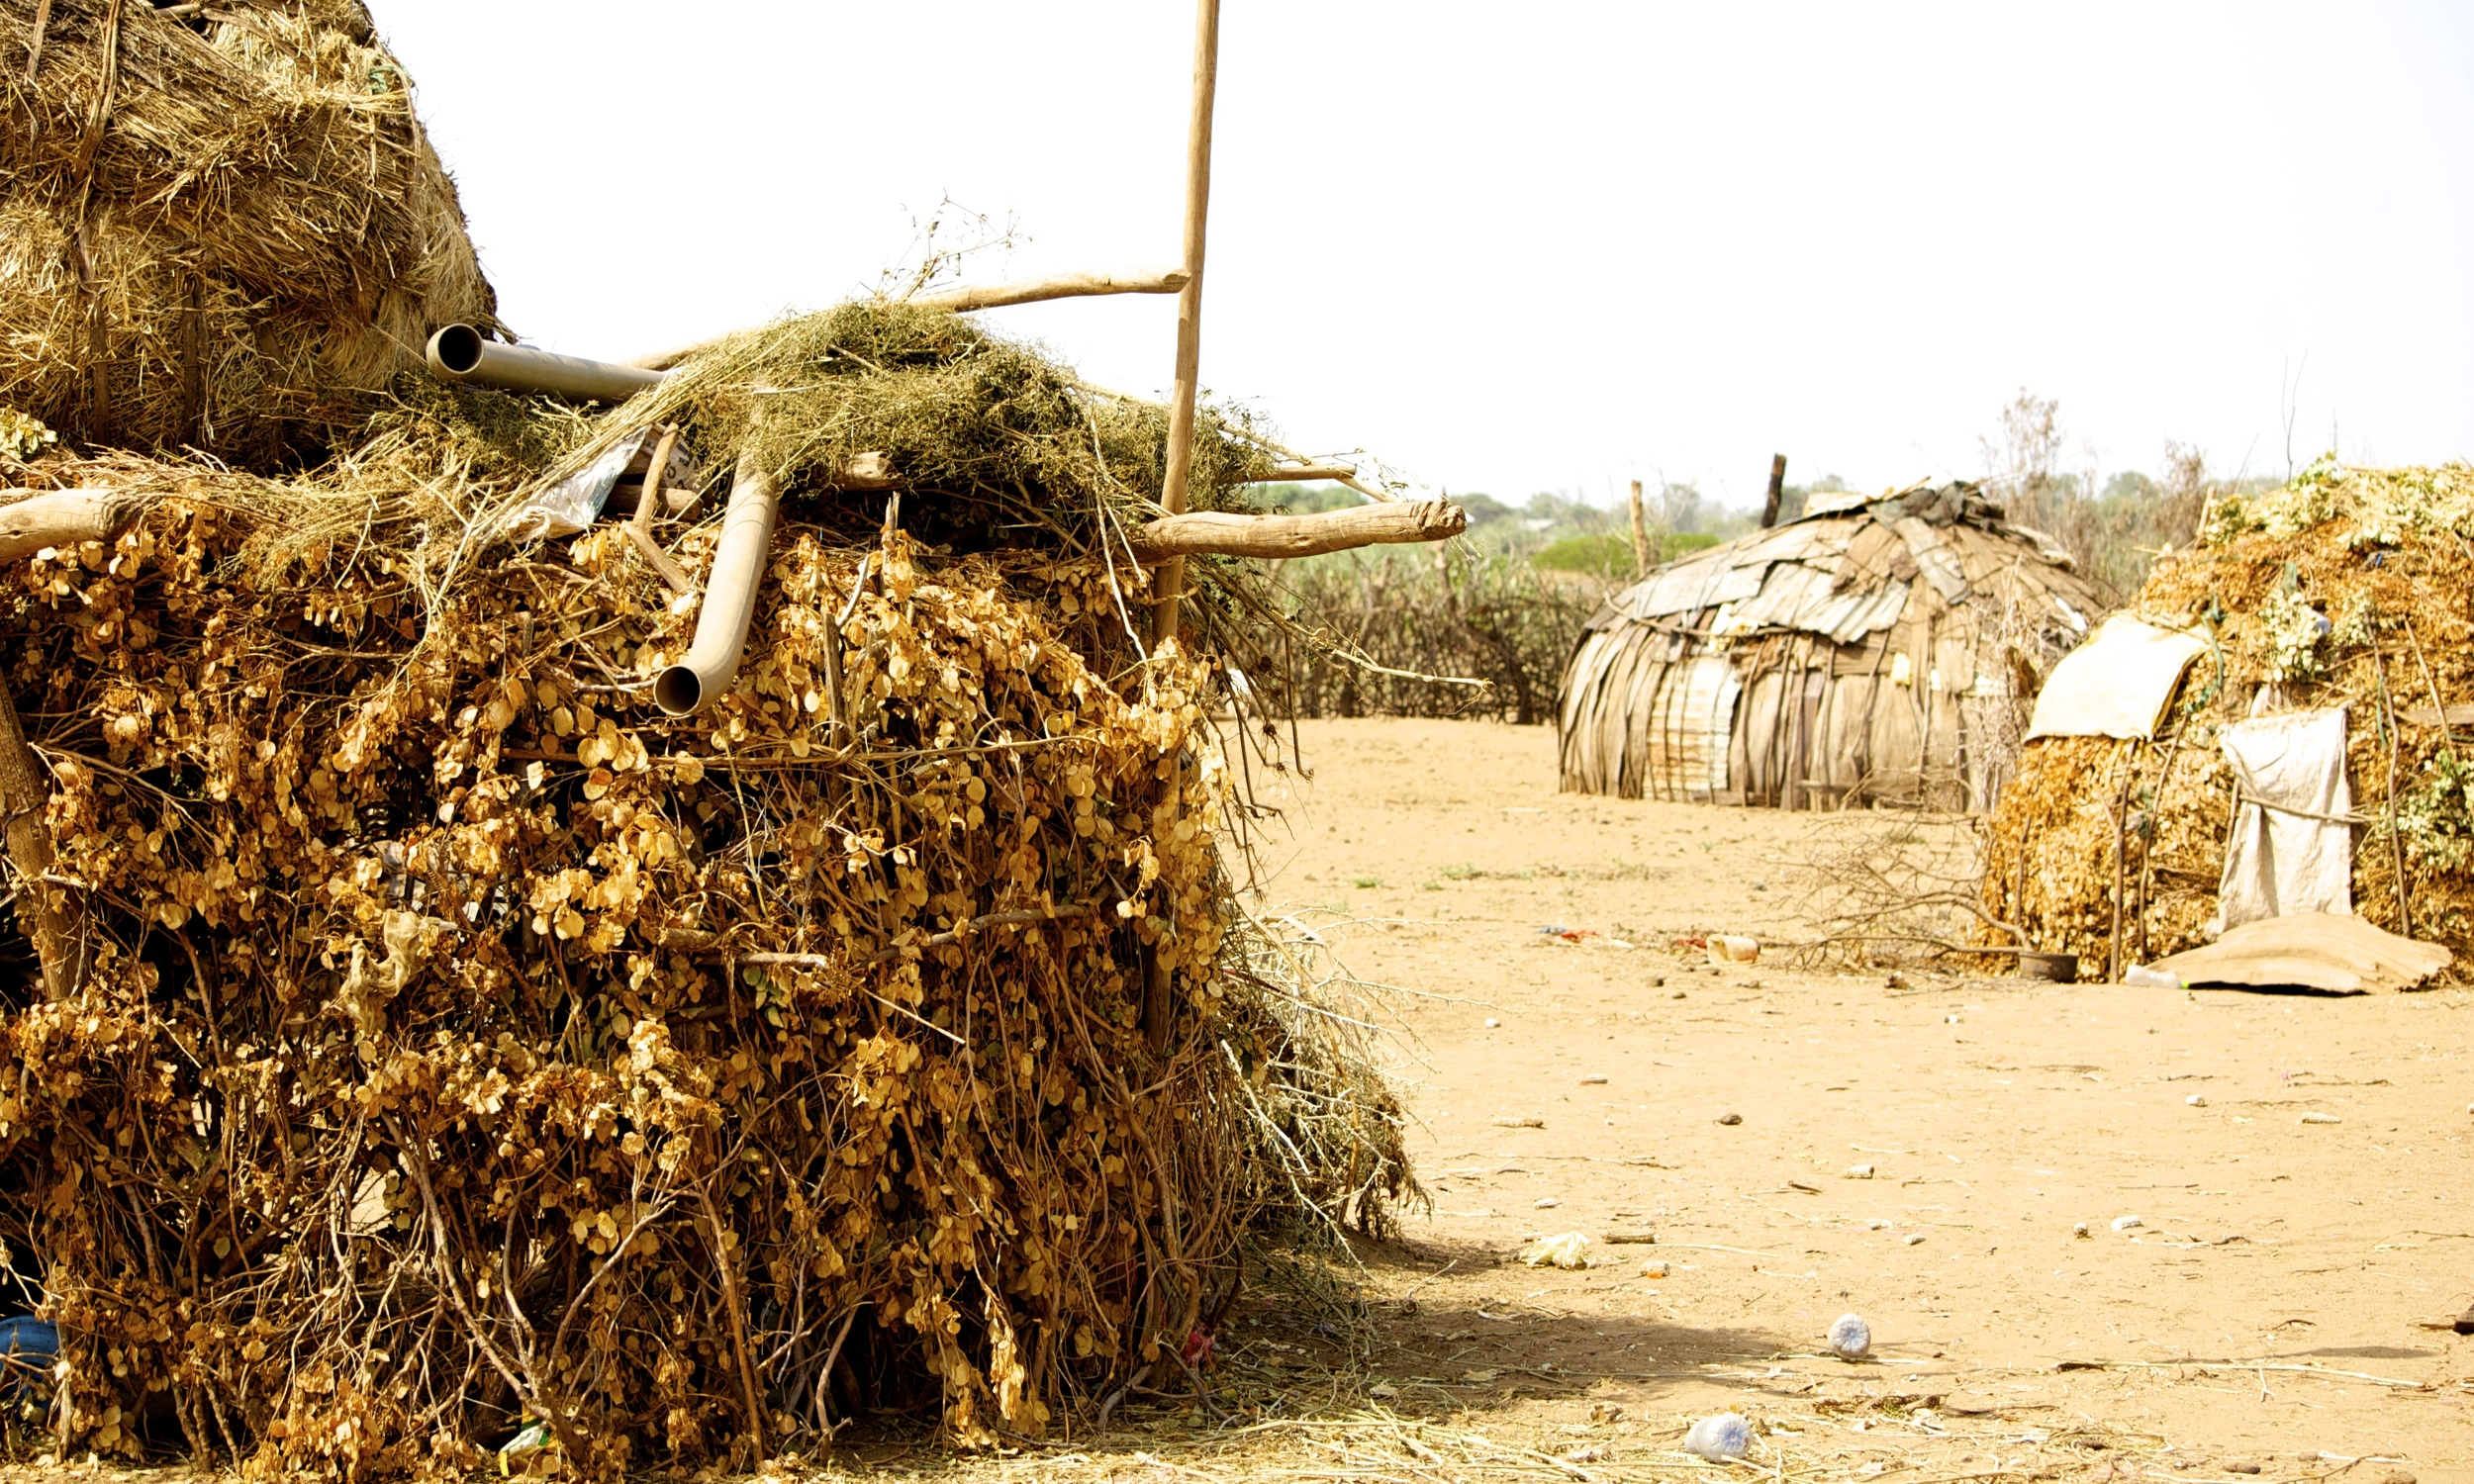 Homes of the Daasanach Tribe